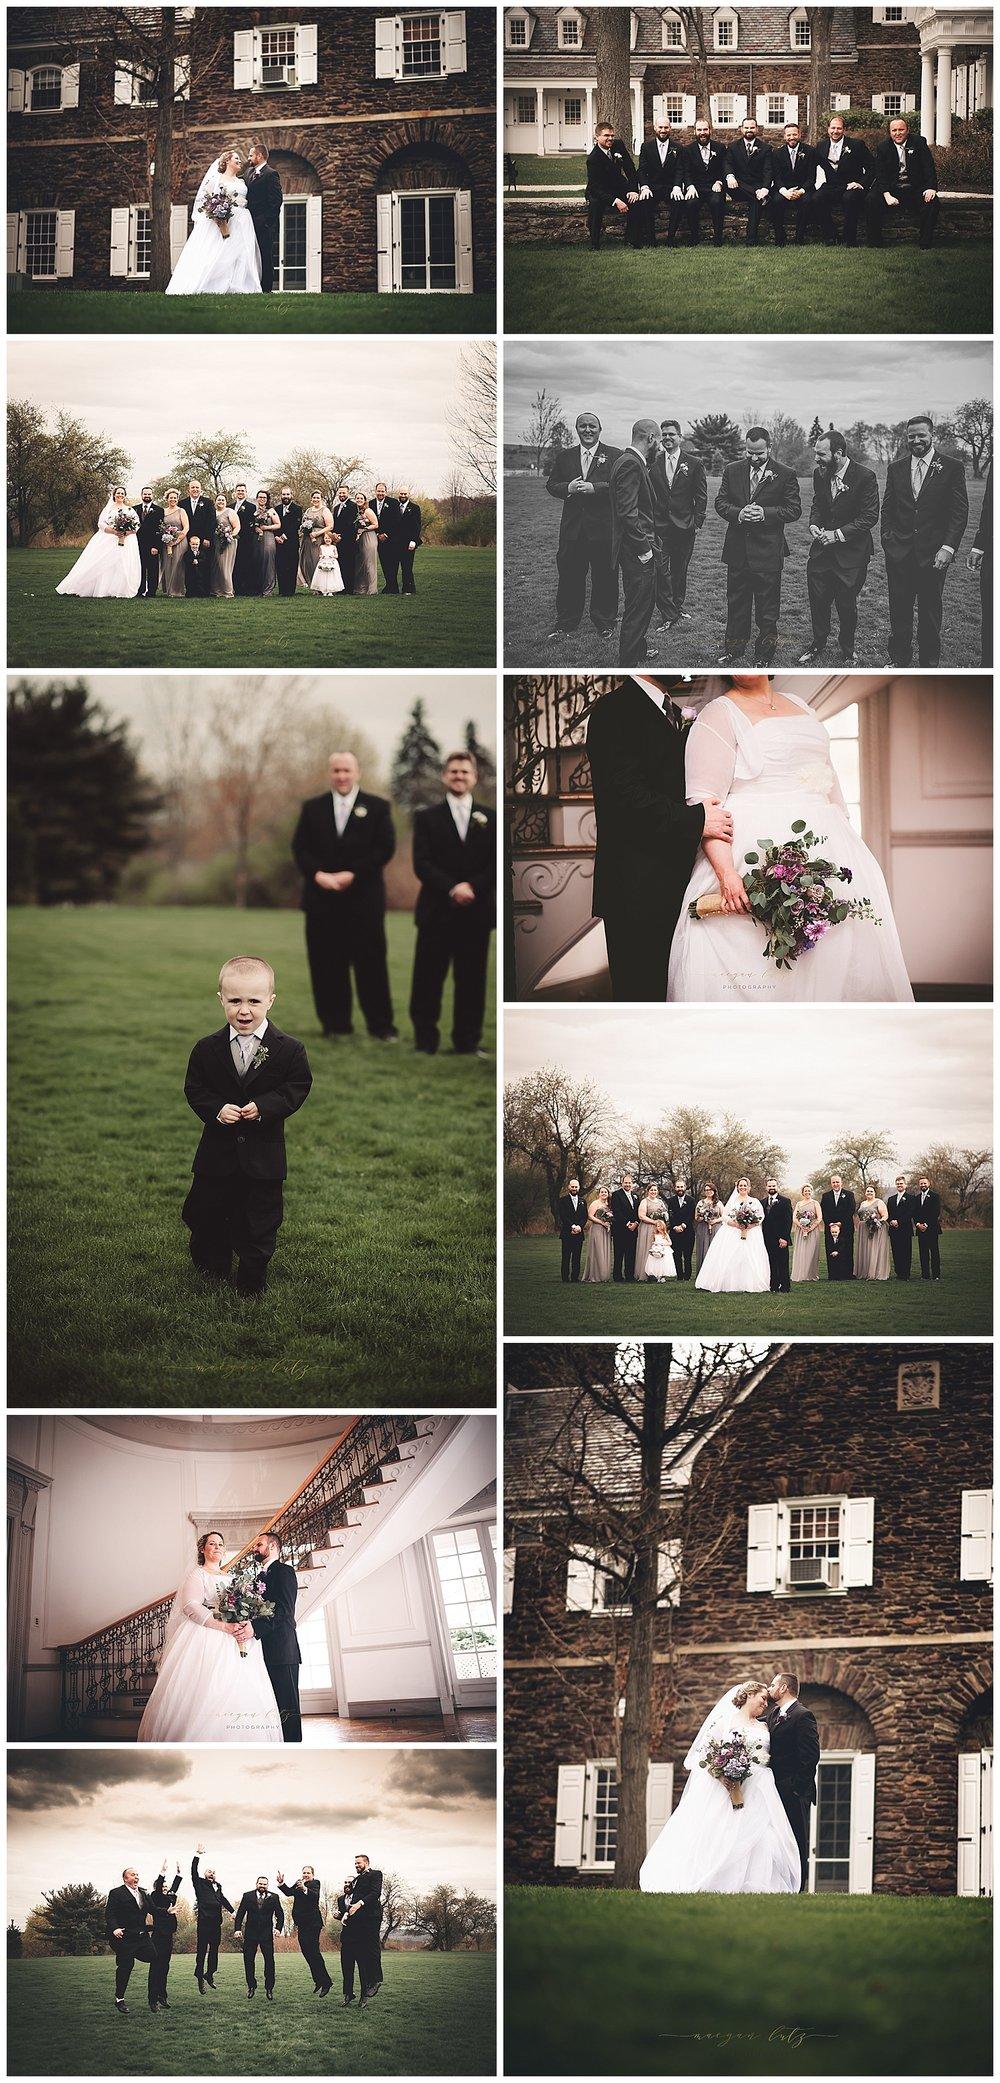 Penn-State-Hayfield-House-Wedding-Photographer-in-Scranton-NEPA_0032.jpg